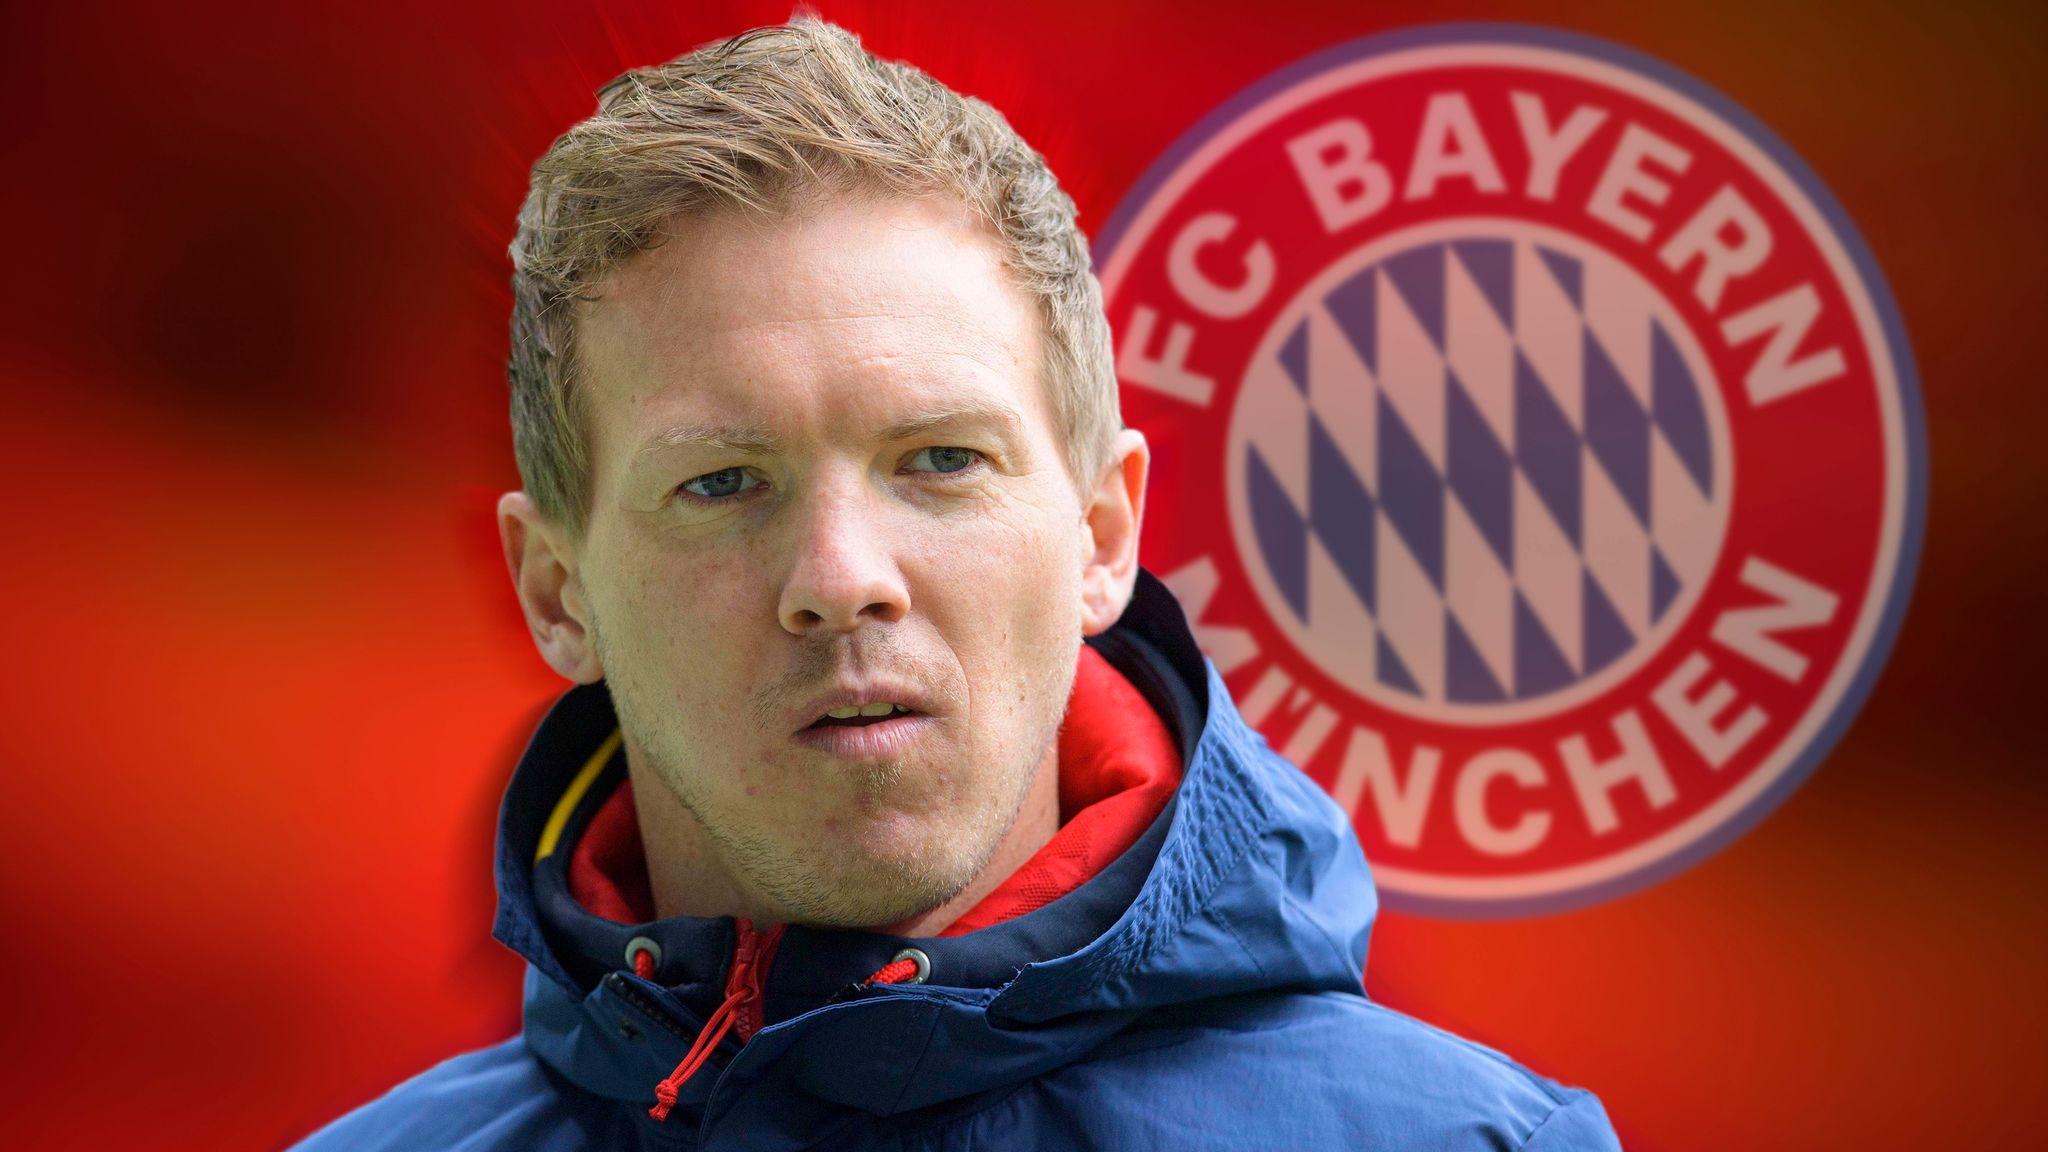 Bayern Coach Nagelsmann Test Positive For Covid-19